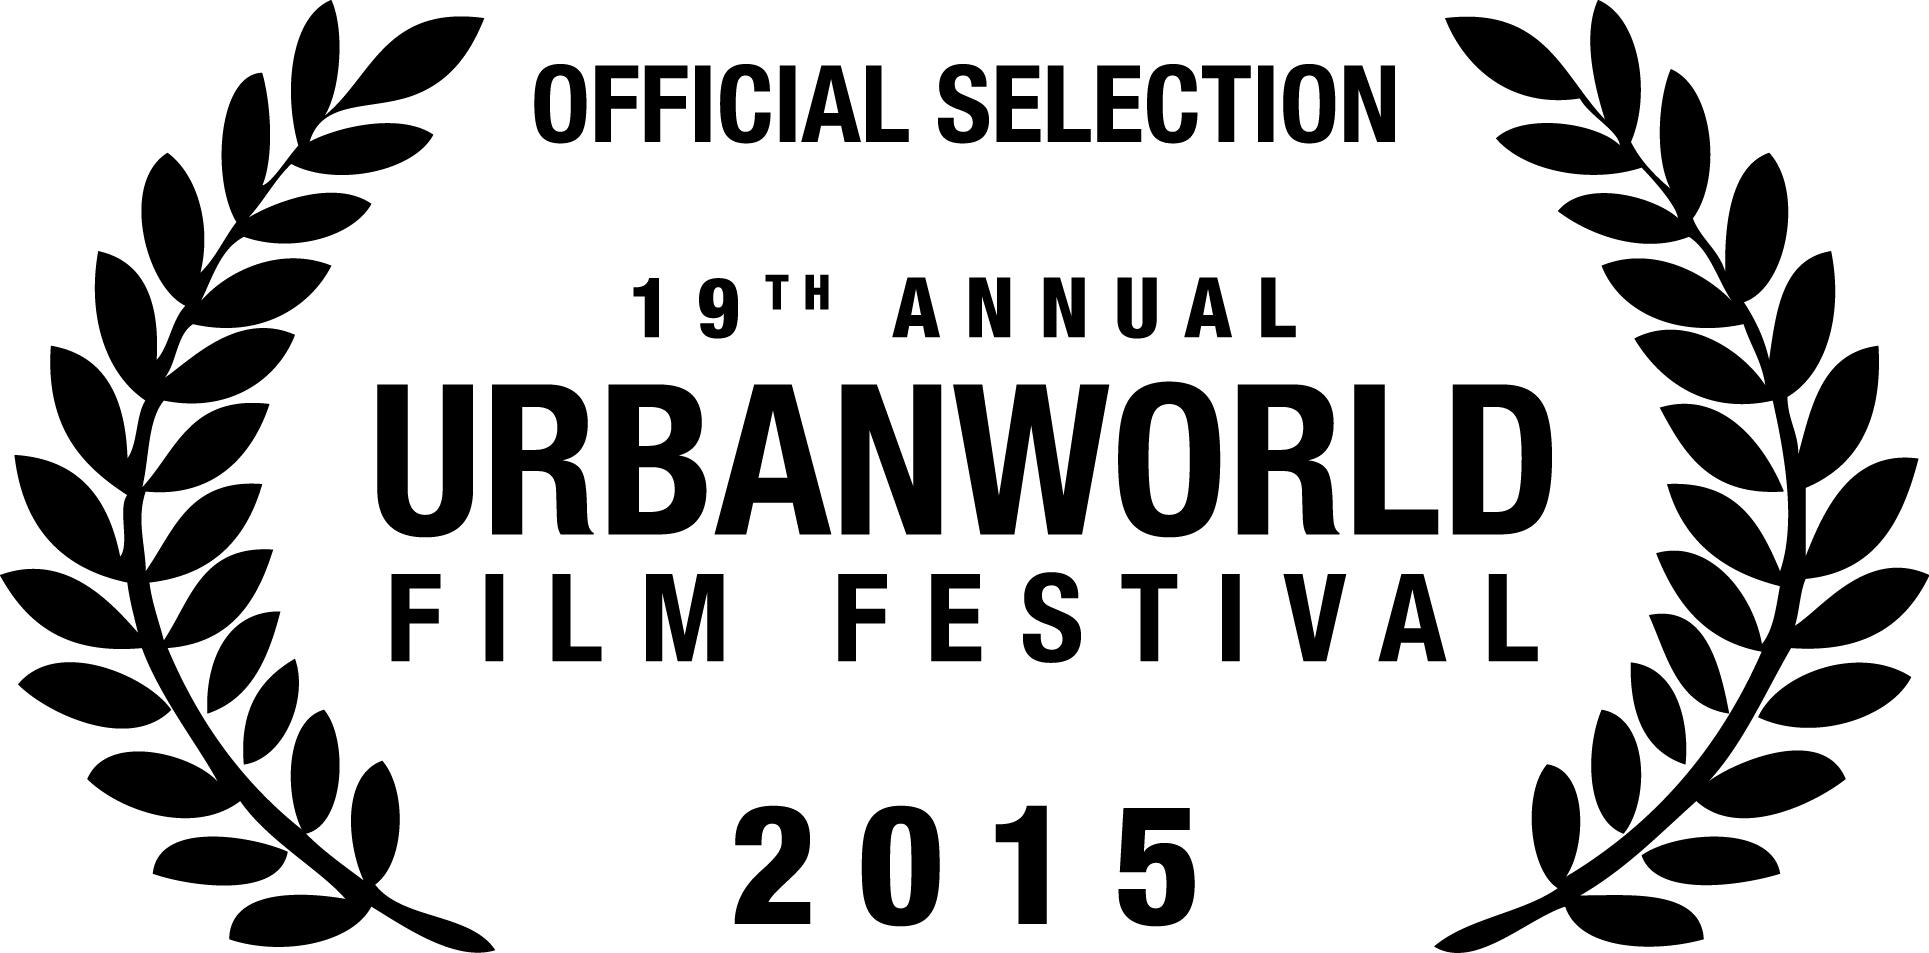 UW15 FestivalLaurels_Selection_OnWhite.jpg